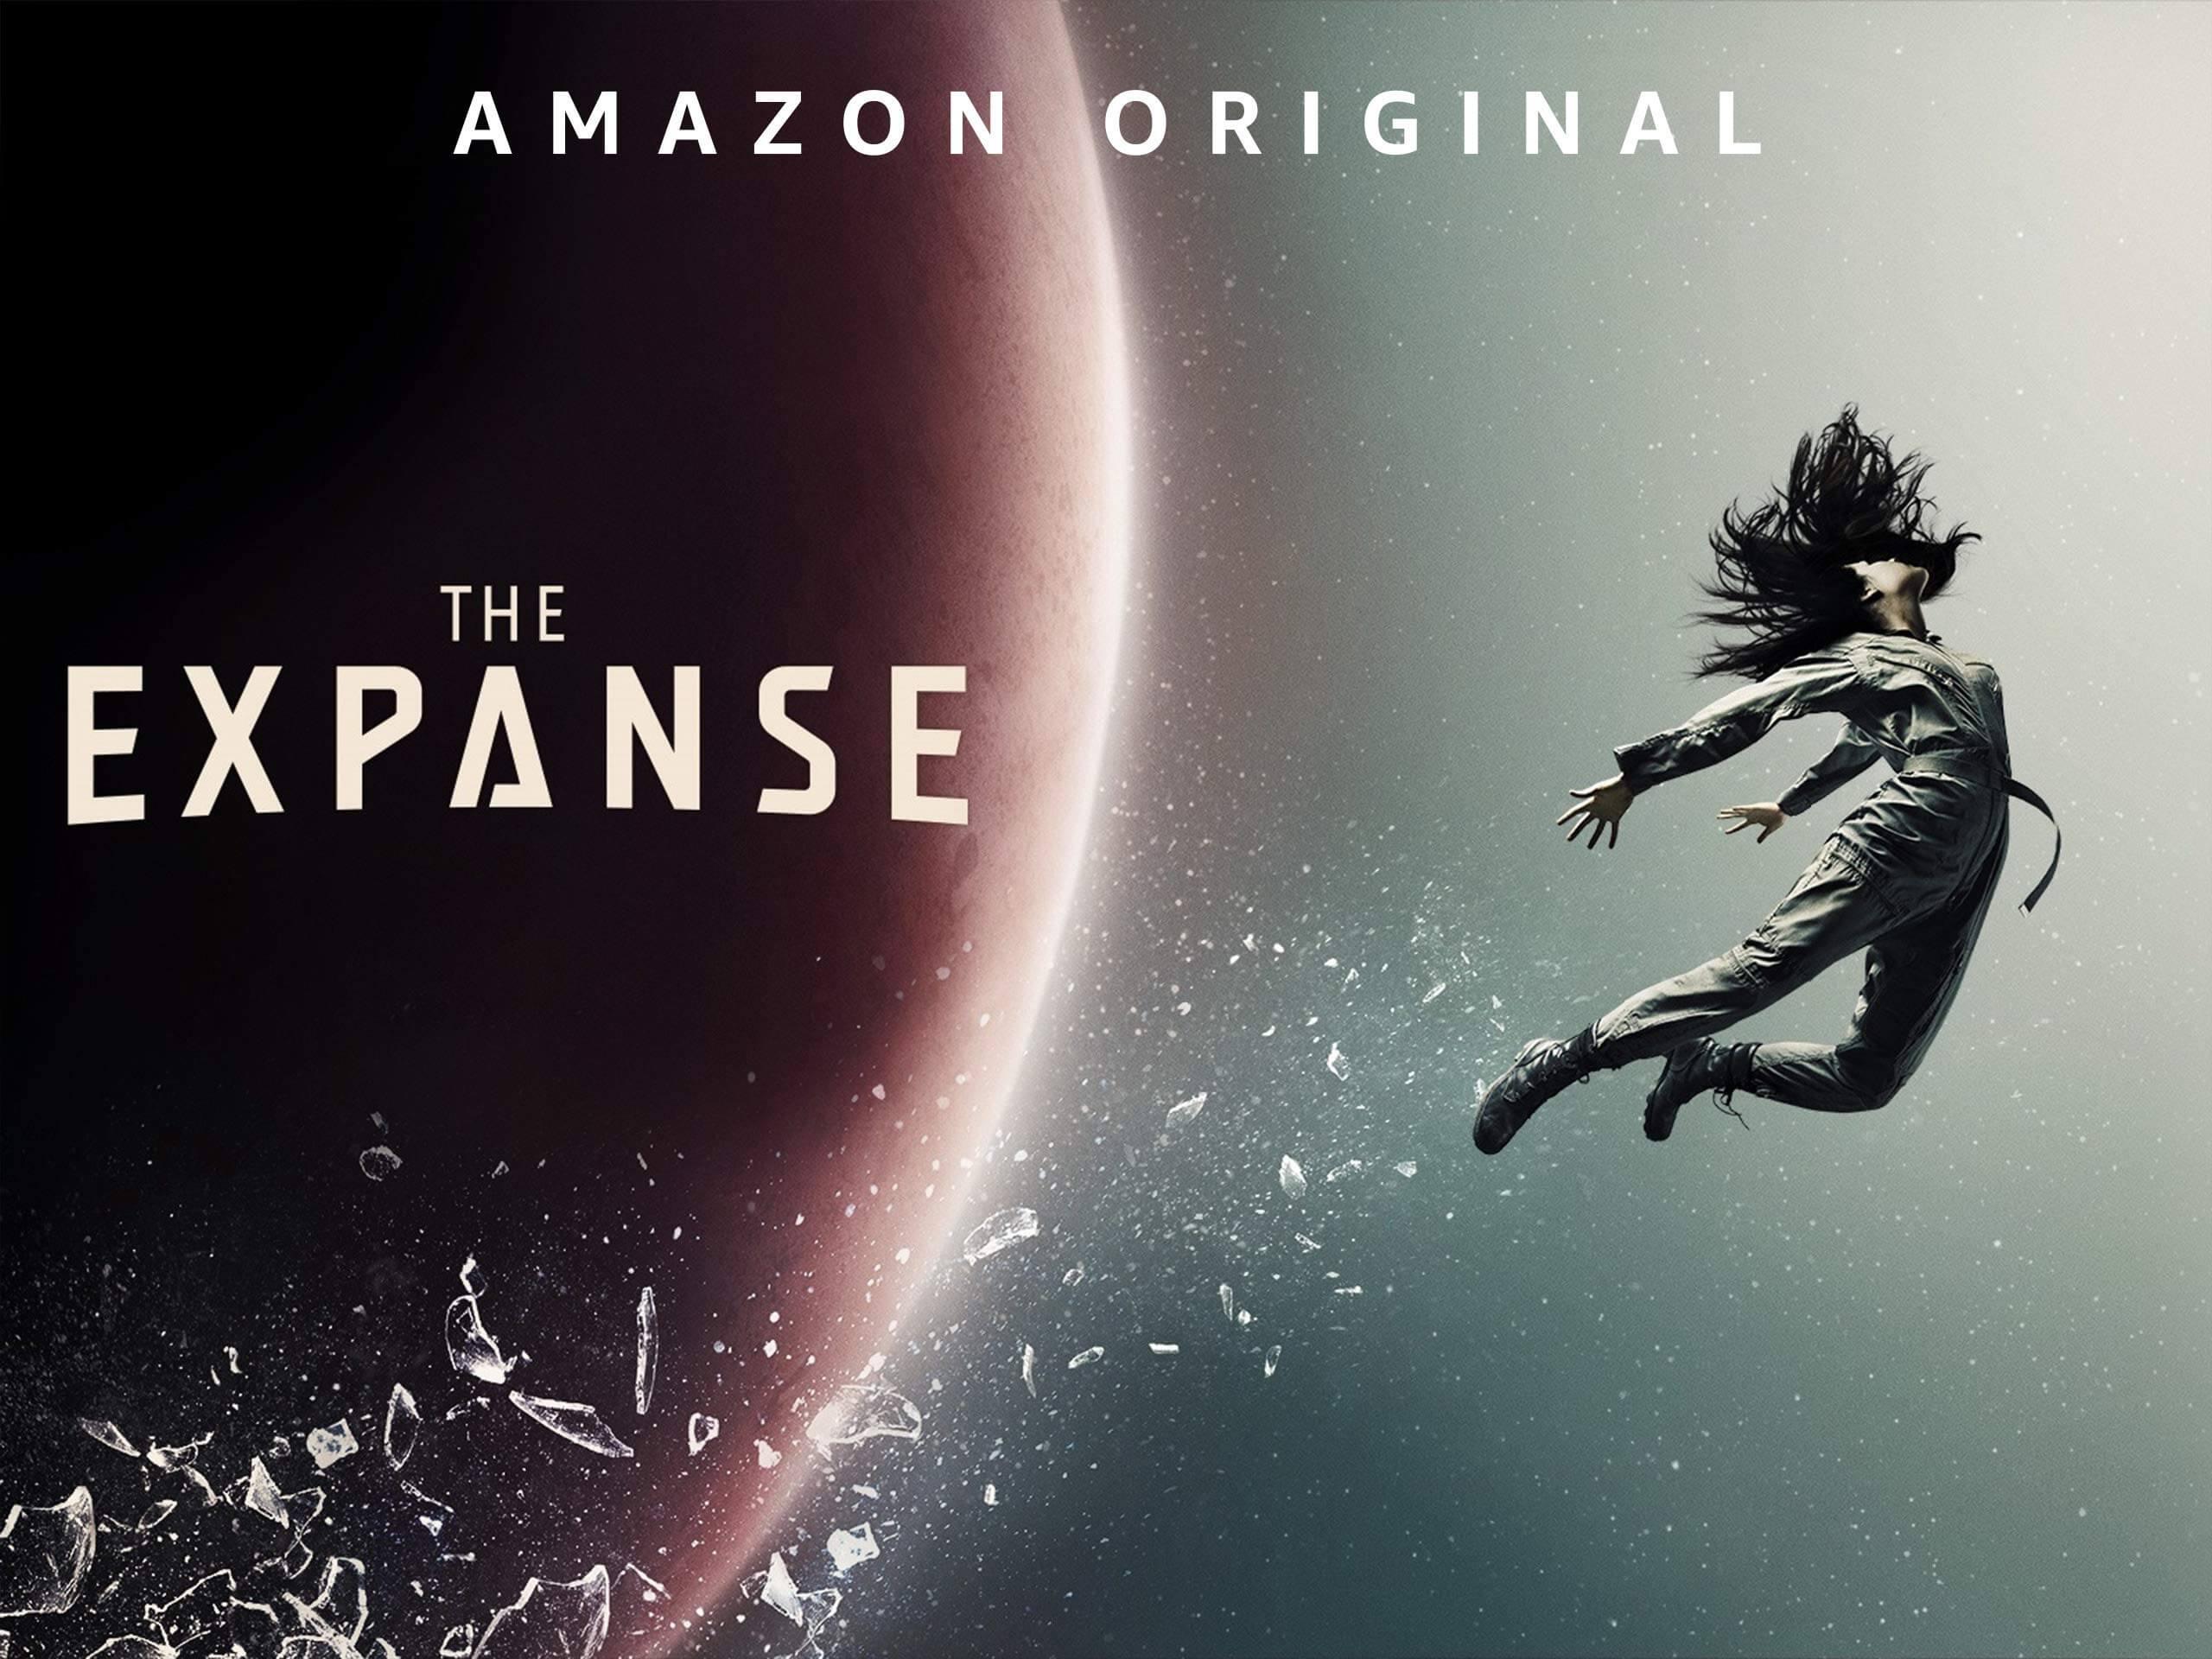 the expanse amazon original